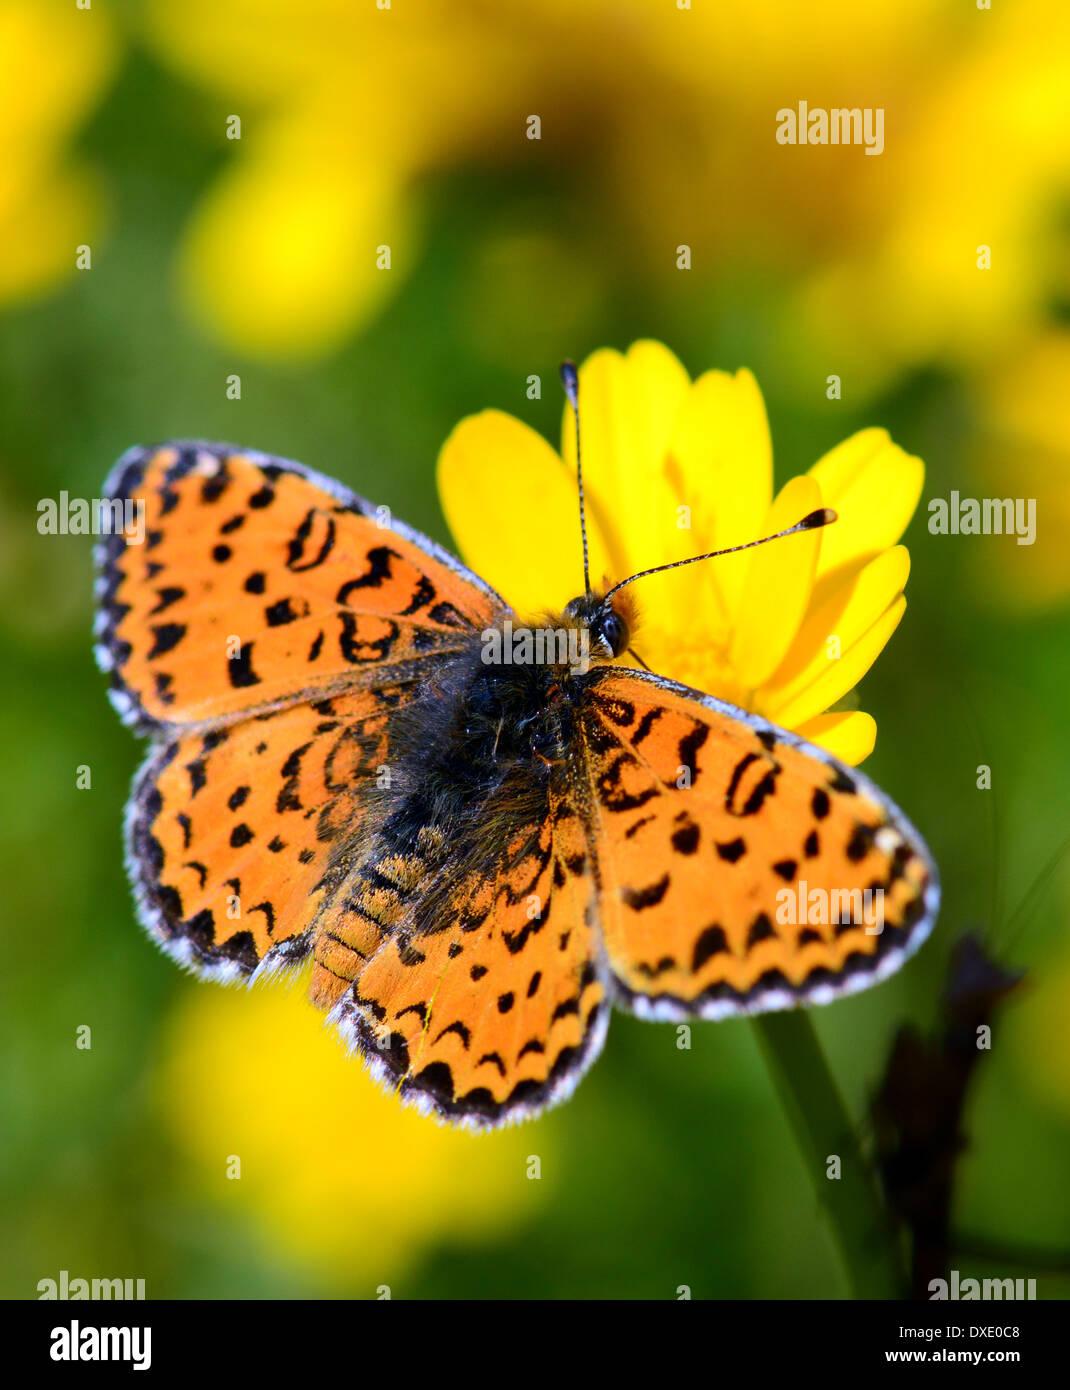 Lesser Spotted Fritillary, Melitaea trivia - Stock Image